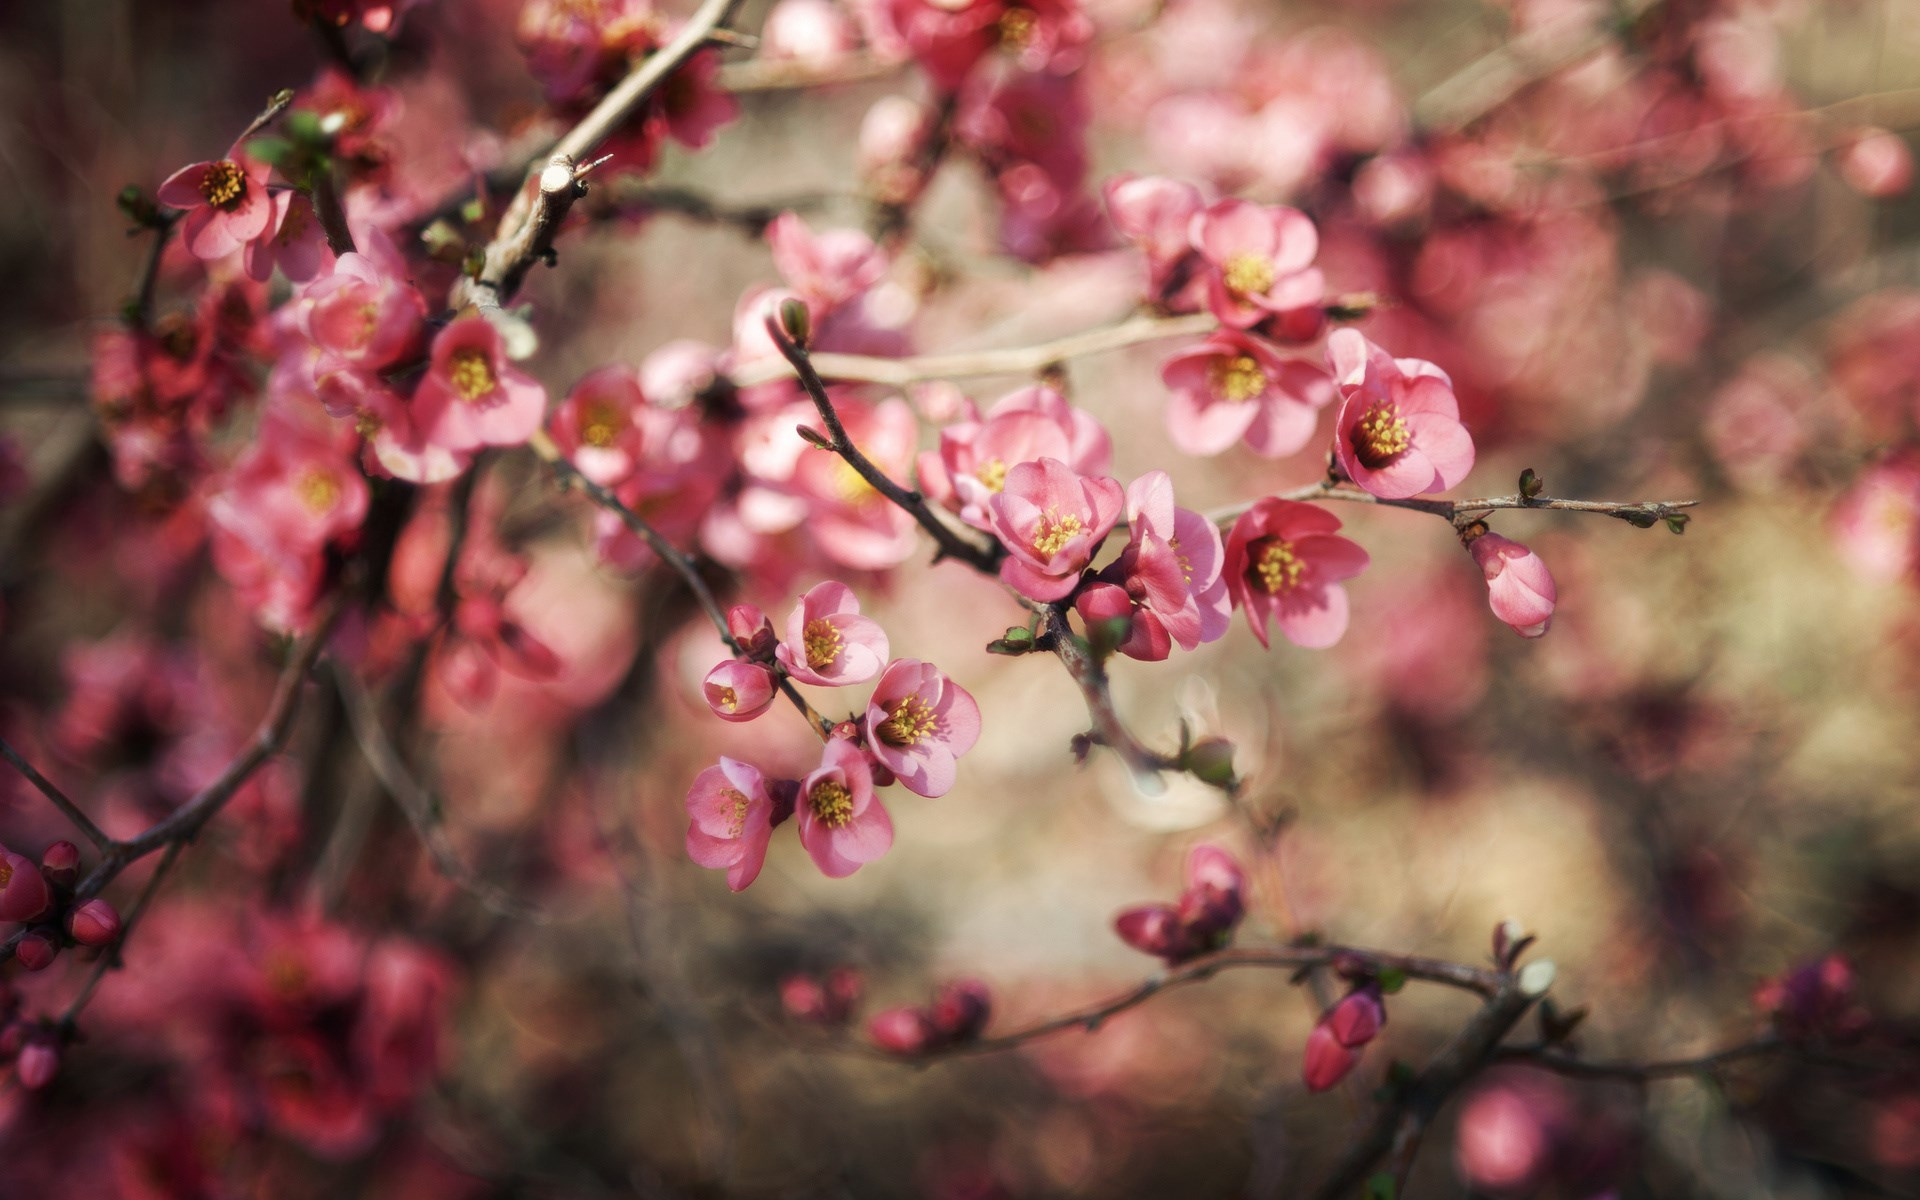 Free Spring Wallpaper Hd For Desktop - Full Hd Nature Pink - HD Wallpaper